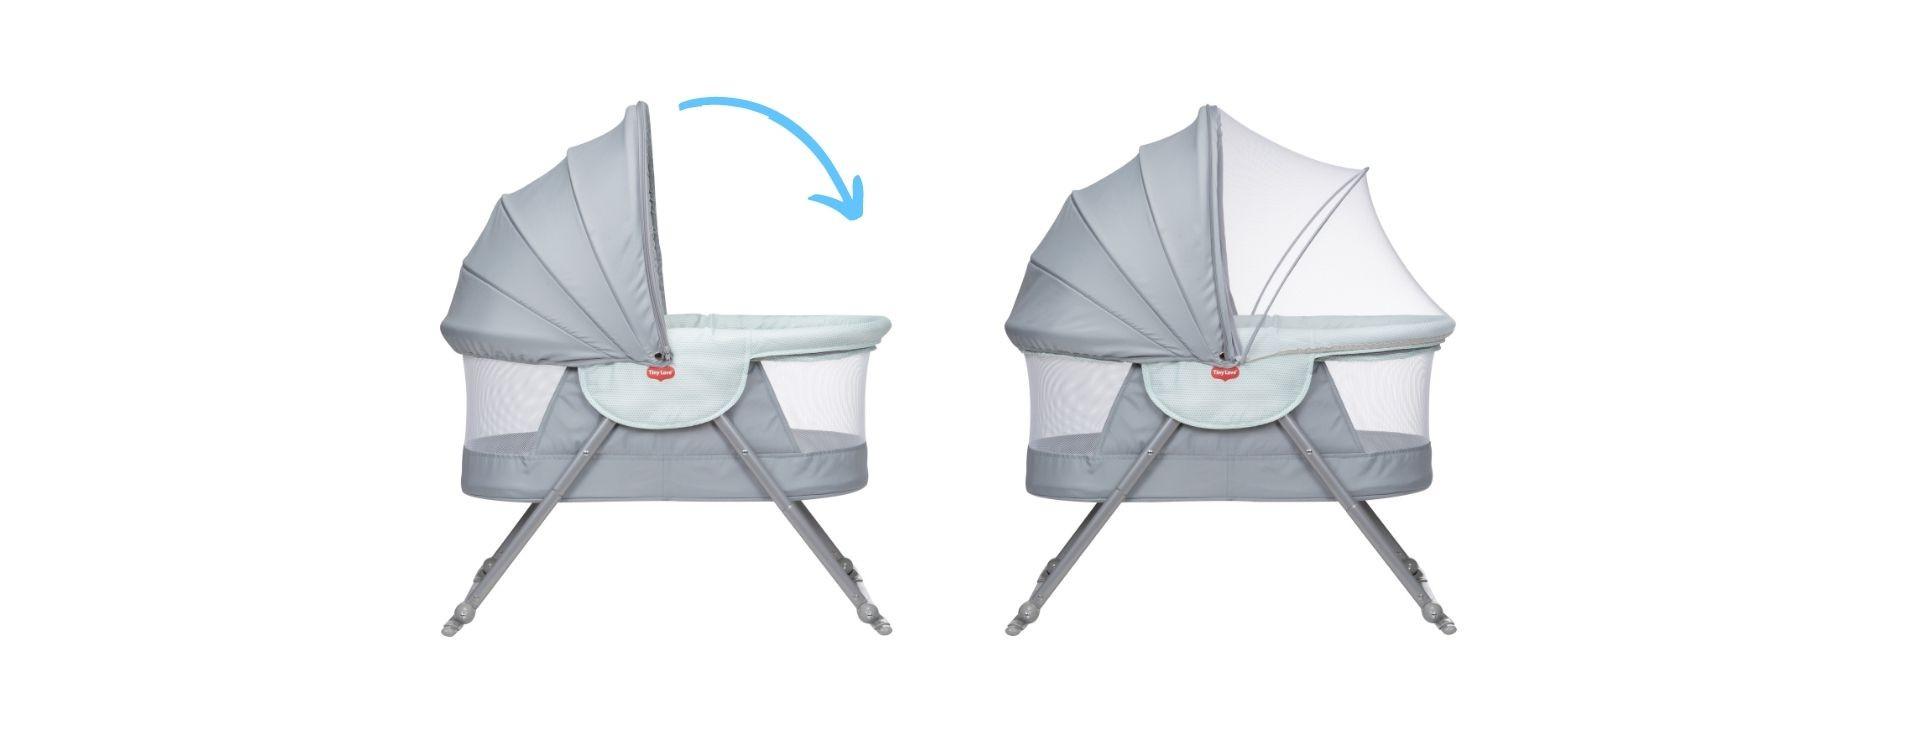 Bug net ensures baby's sleep is undisturbed